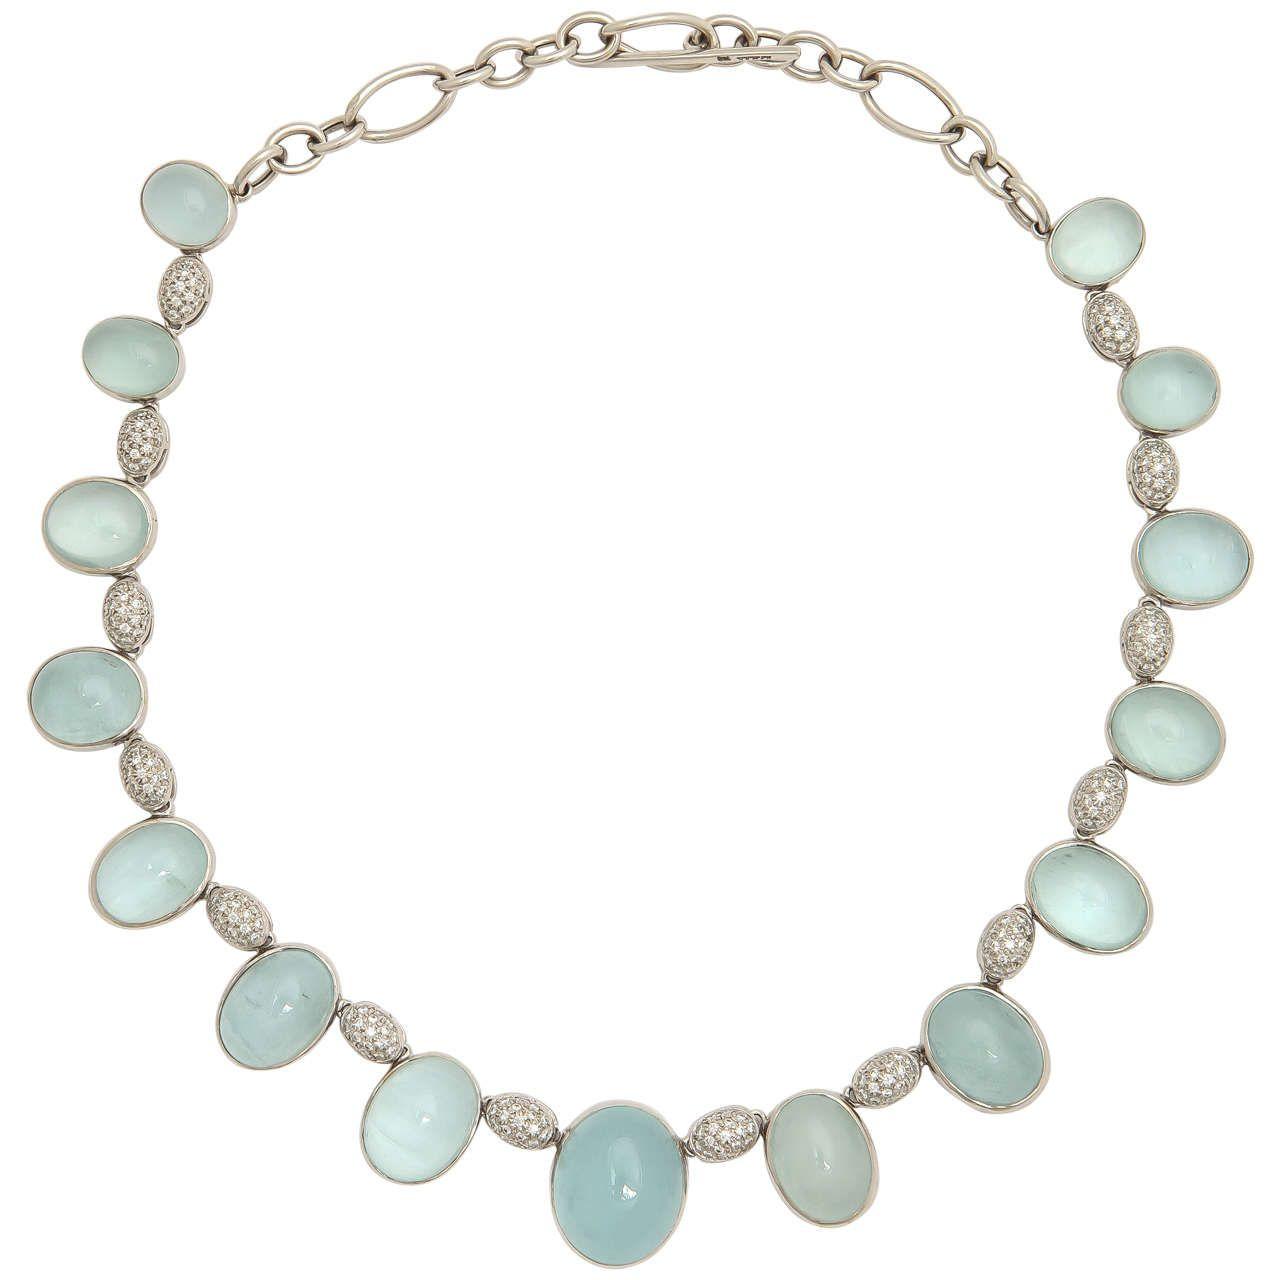 Faraone Mennella Letitia Aquamarine Diamond Gold Drop Necklace For Sale at 1stdibs